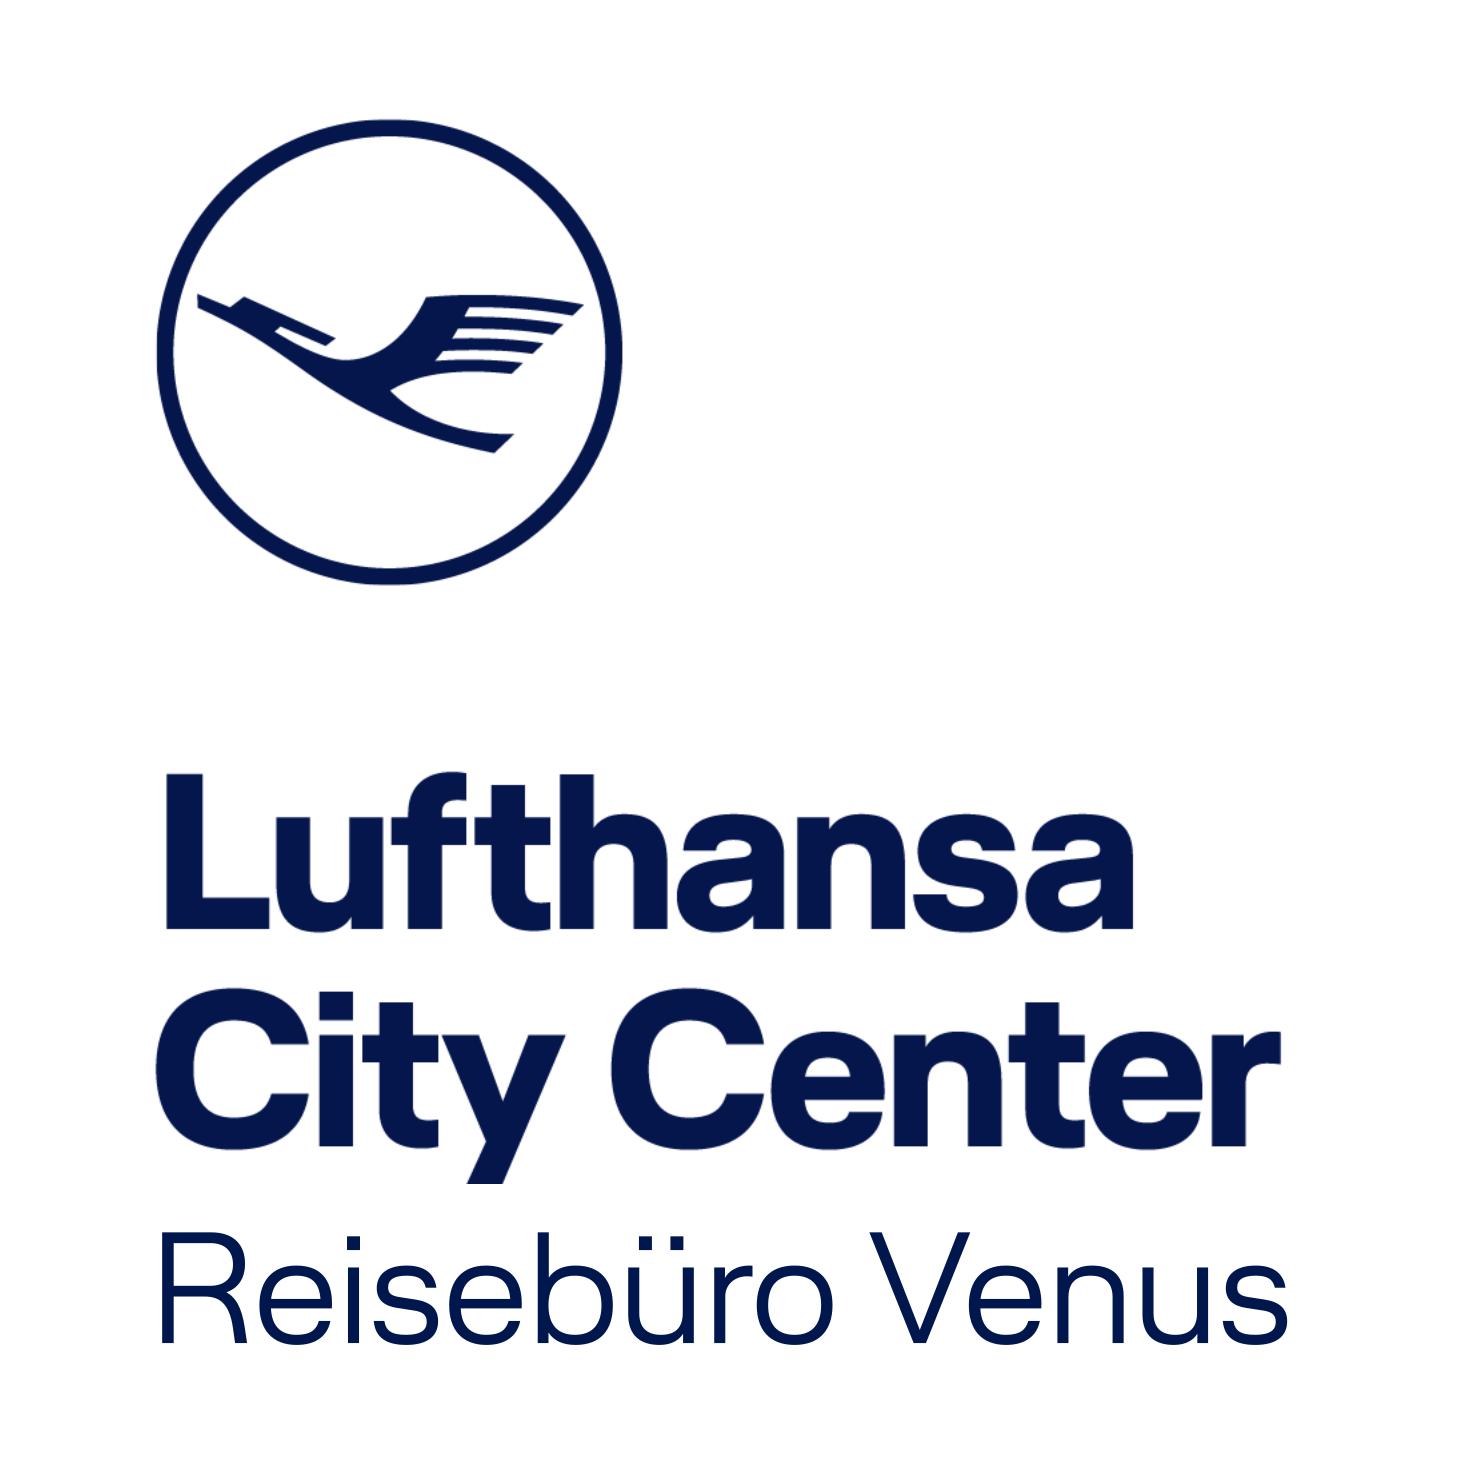 Reisebüro Venus Lufthansa City Center